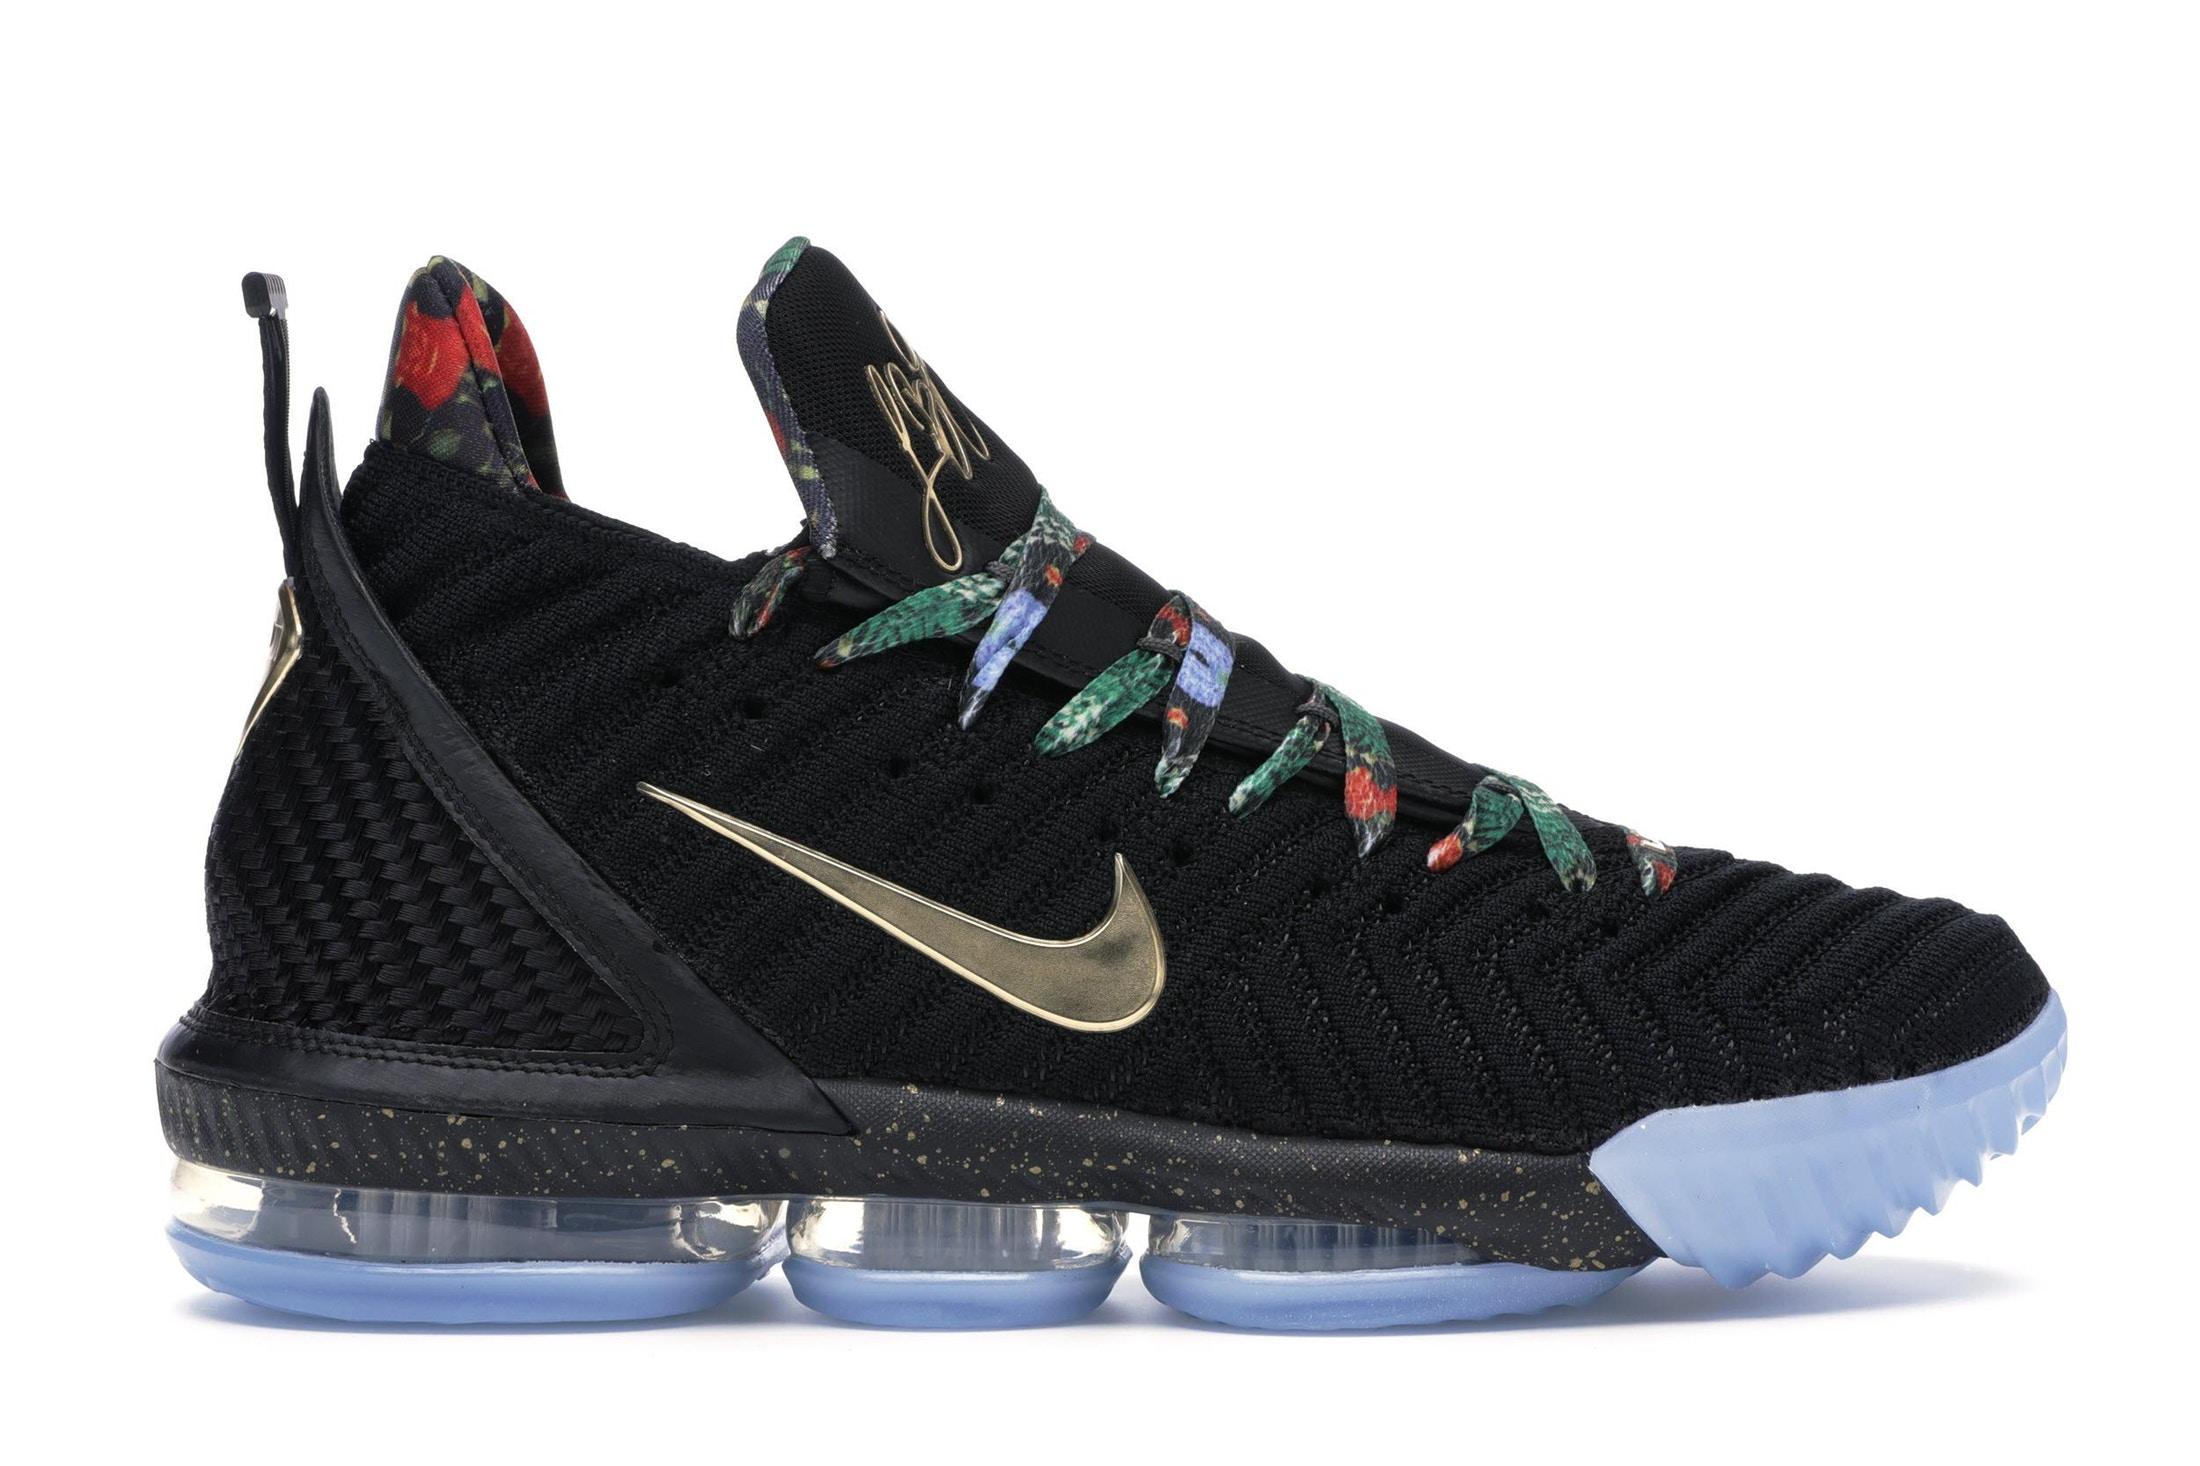 Nike Lebron 16 'Watch The Throne'